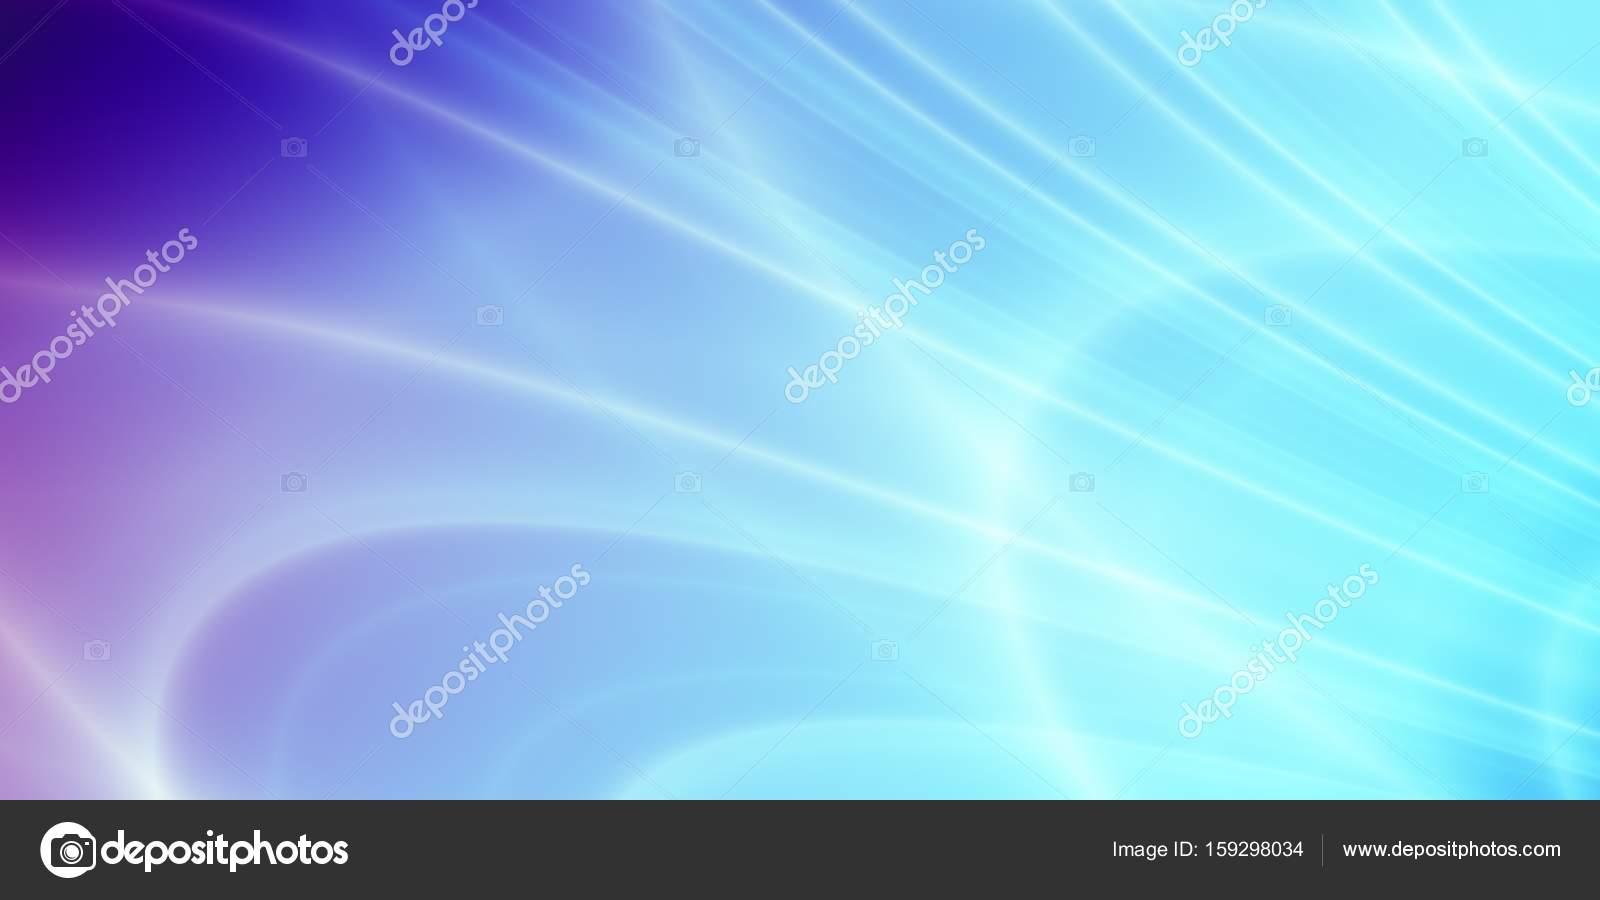 Blue Crazy Wave Summer Fun Wallpaper Stock Photo C Riariu 159298034